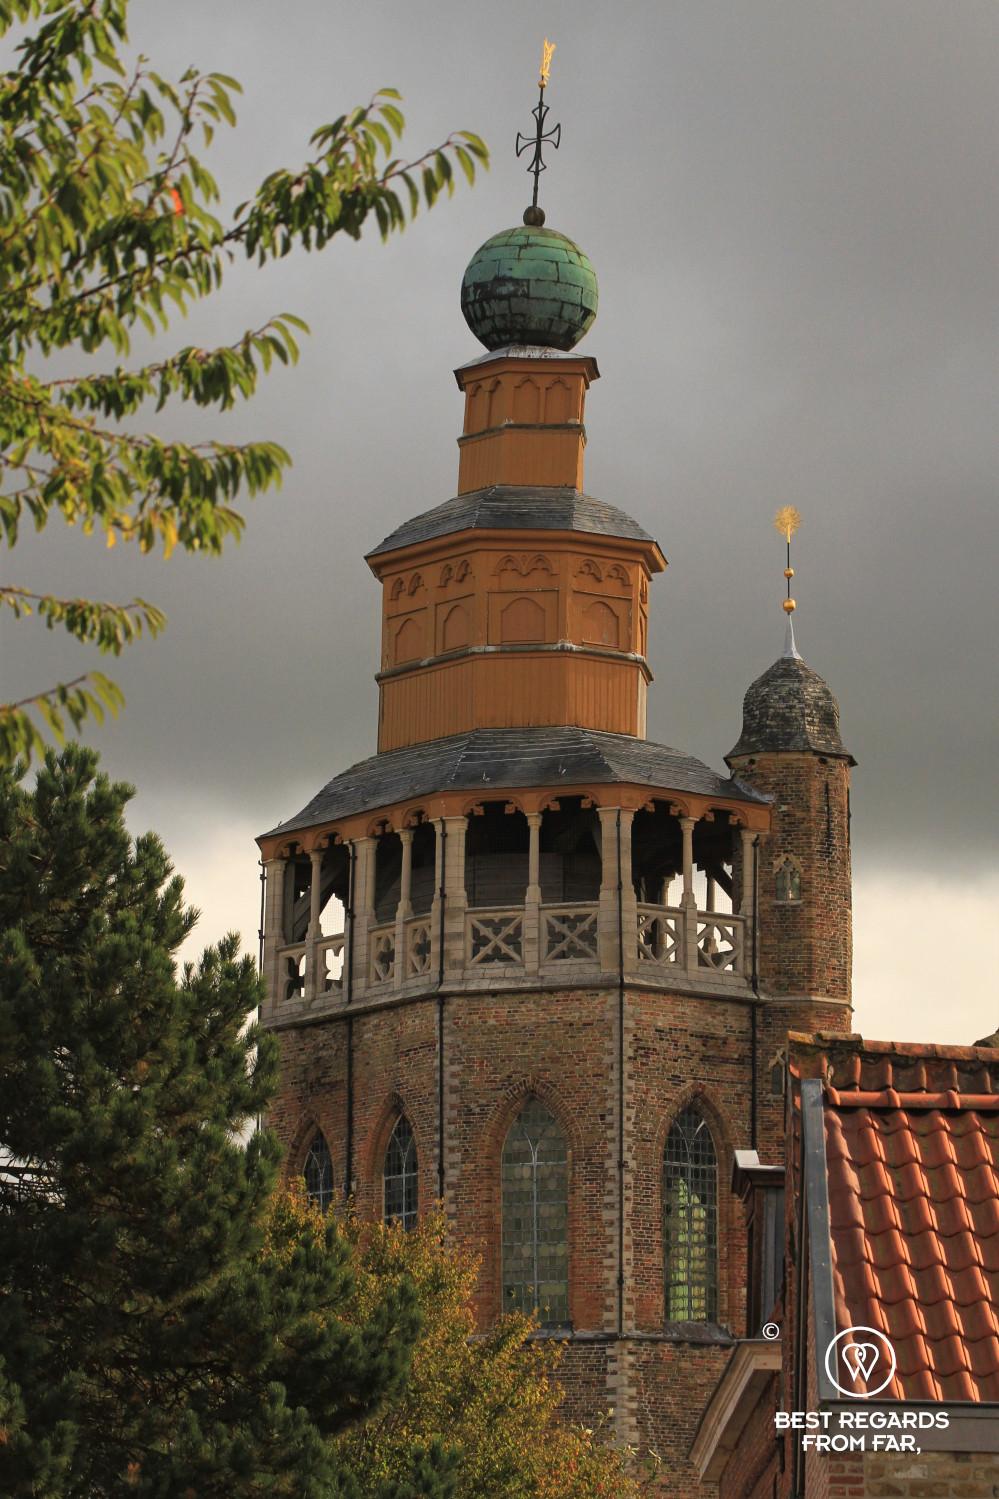 The oriental architecture of the Jerusalem Chapel, Bruges, Belgium.